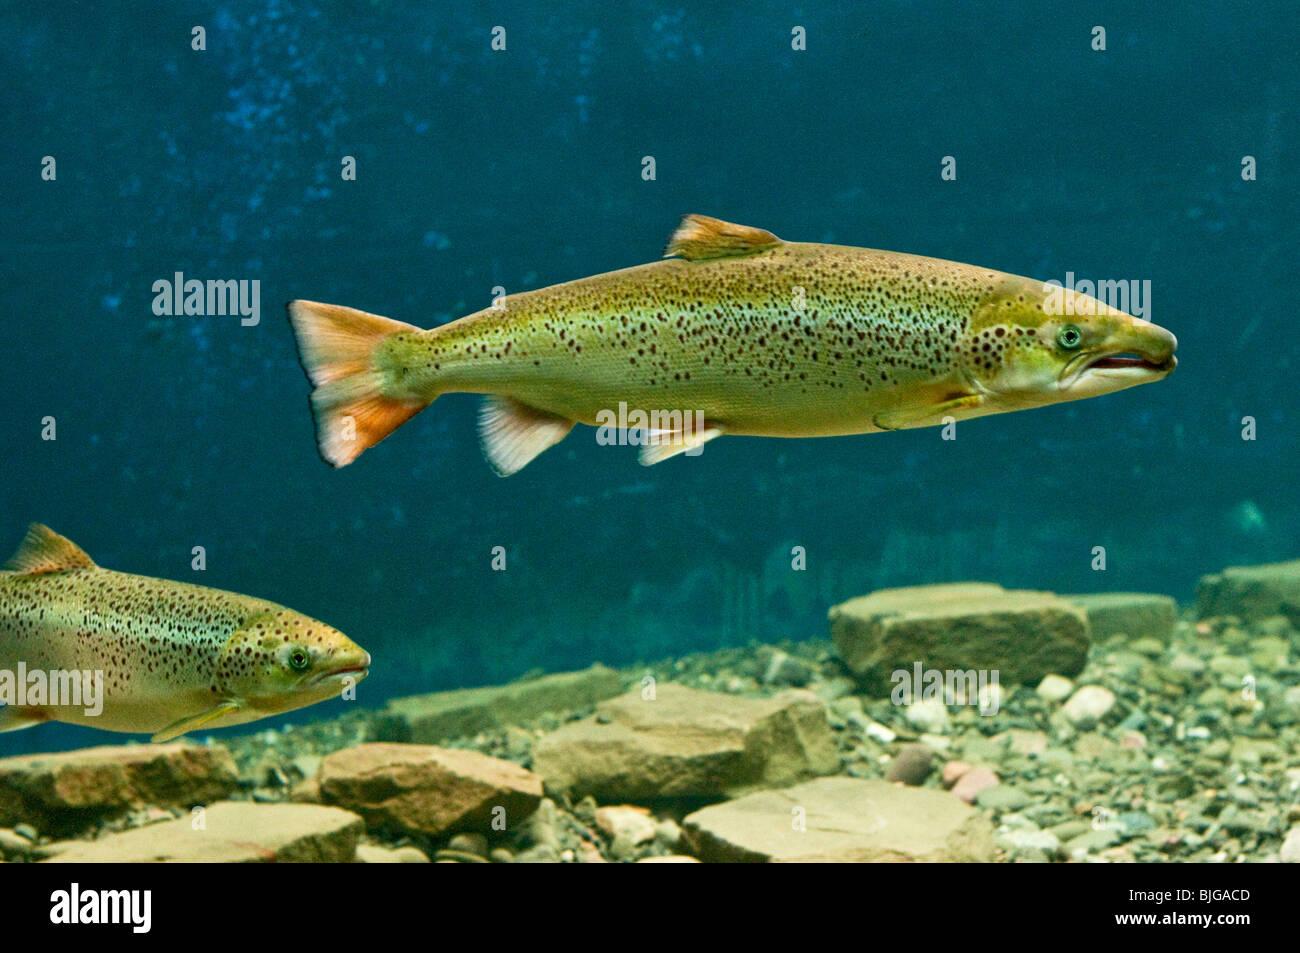 NEW BRUNSWICK, Atantic Salmon Museum in Doaktown. Atlantic Salmon swimming in fish aquarium. Miramichi River. - Stock Image